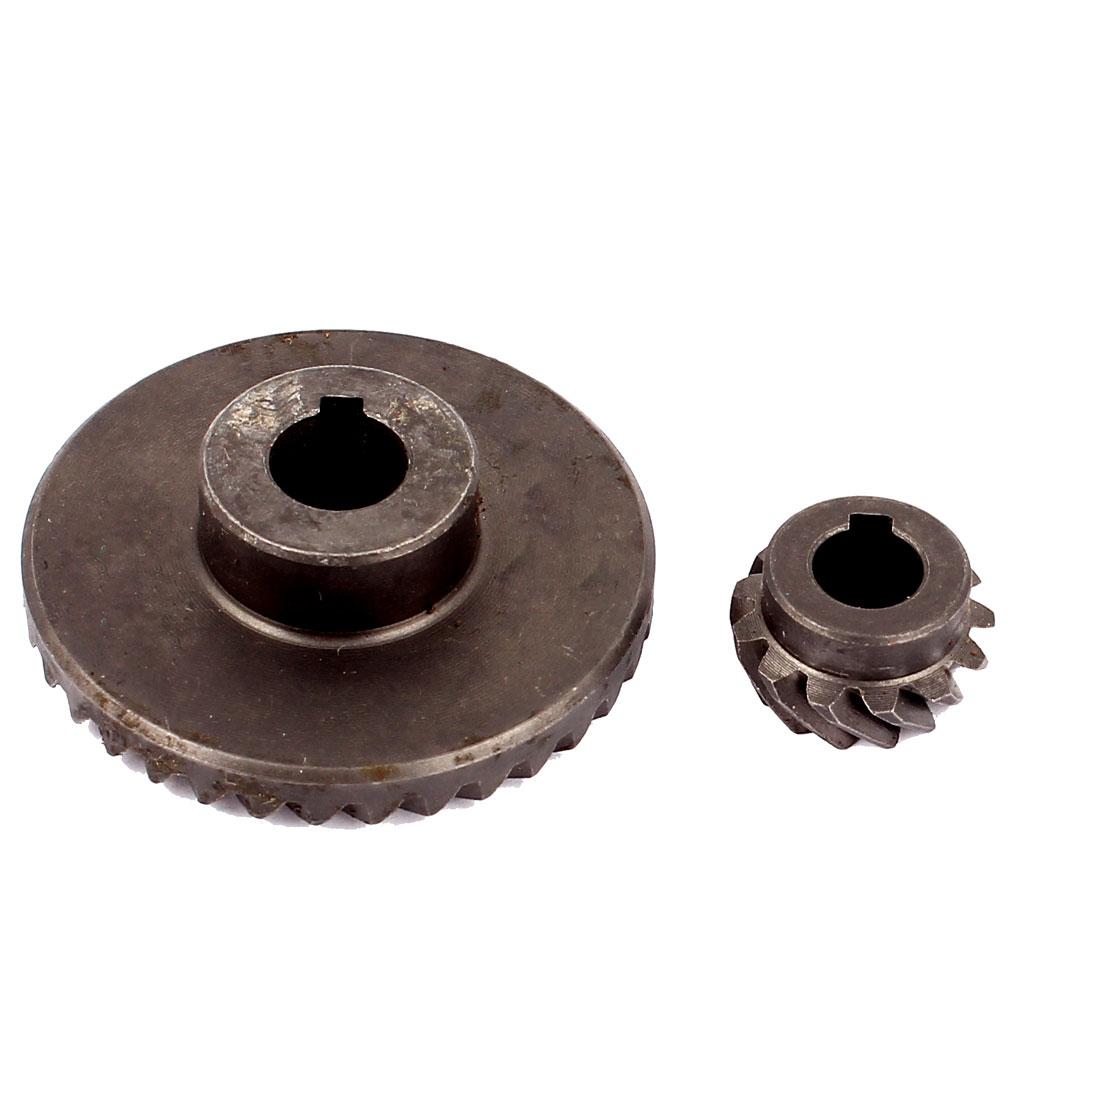 Spare Part Metal Electric Angle Grinder Spiral Bevel Gear Set Dark Gray